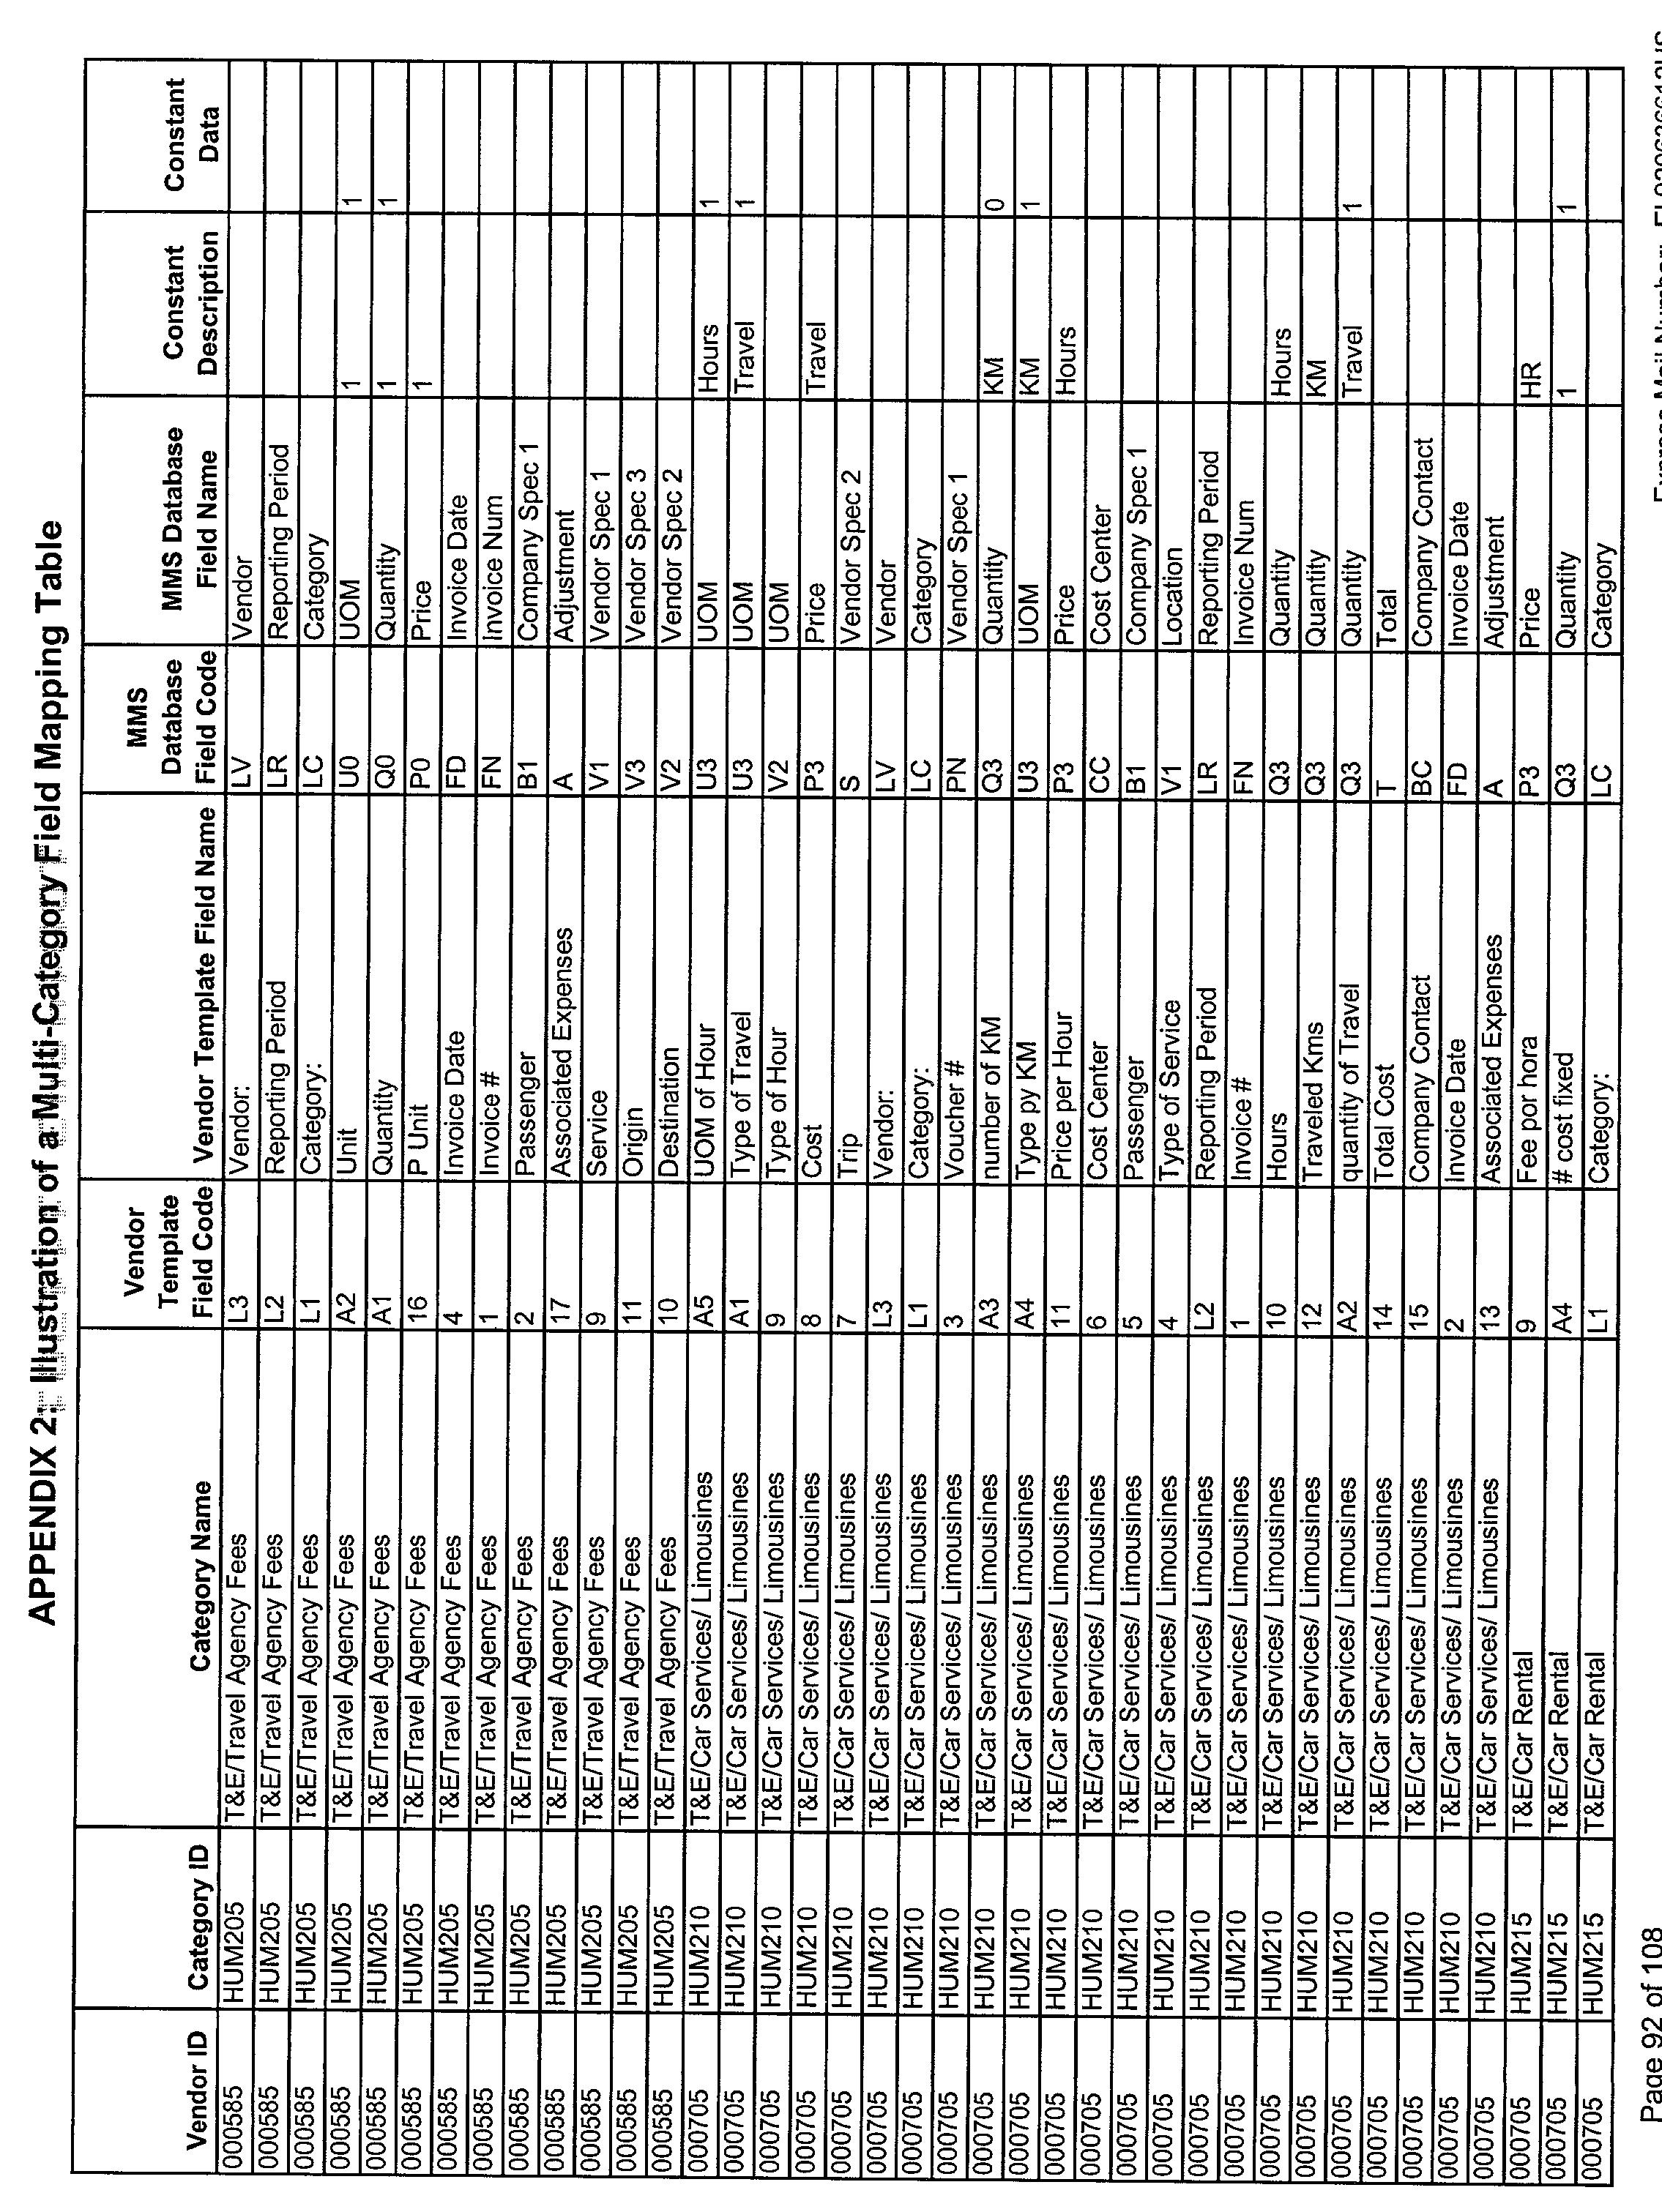 Figure US20020128938A1-20020912-P00033